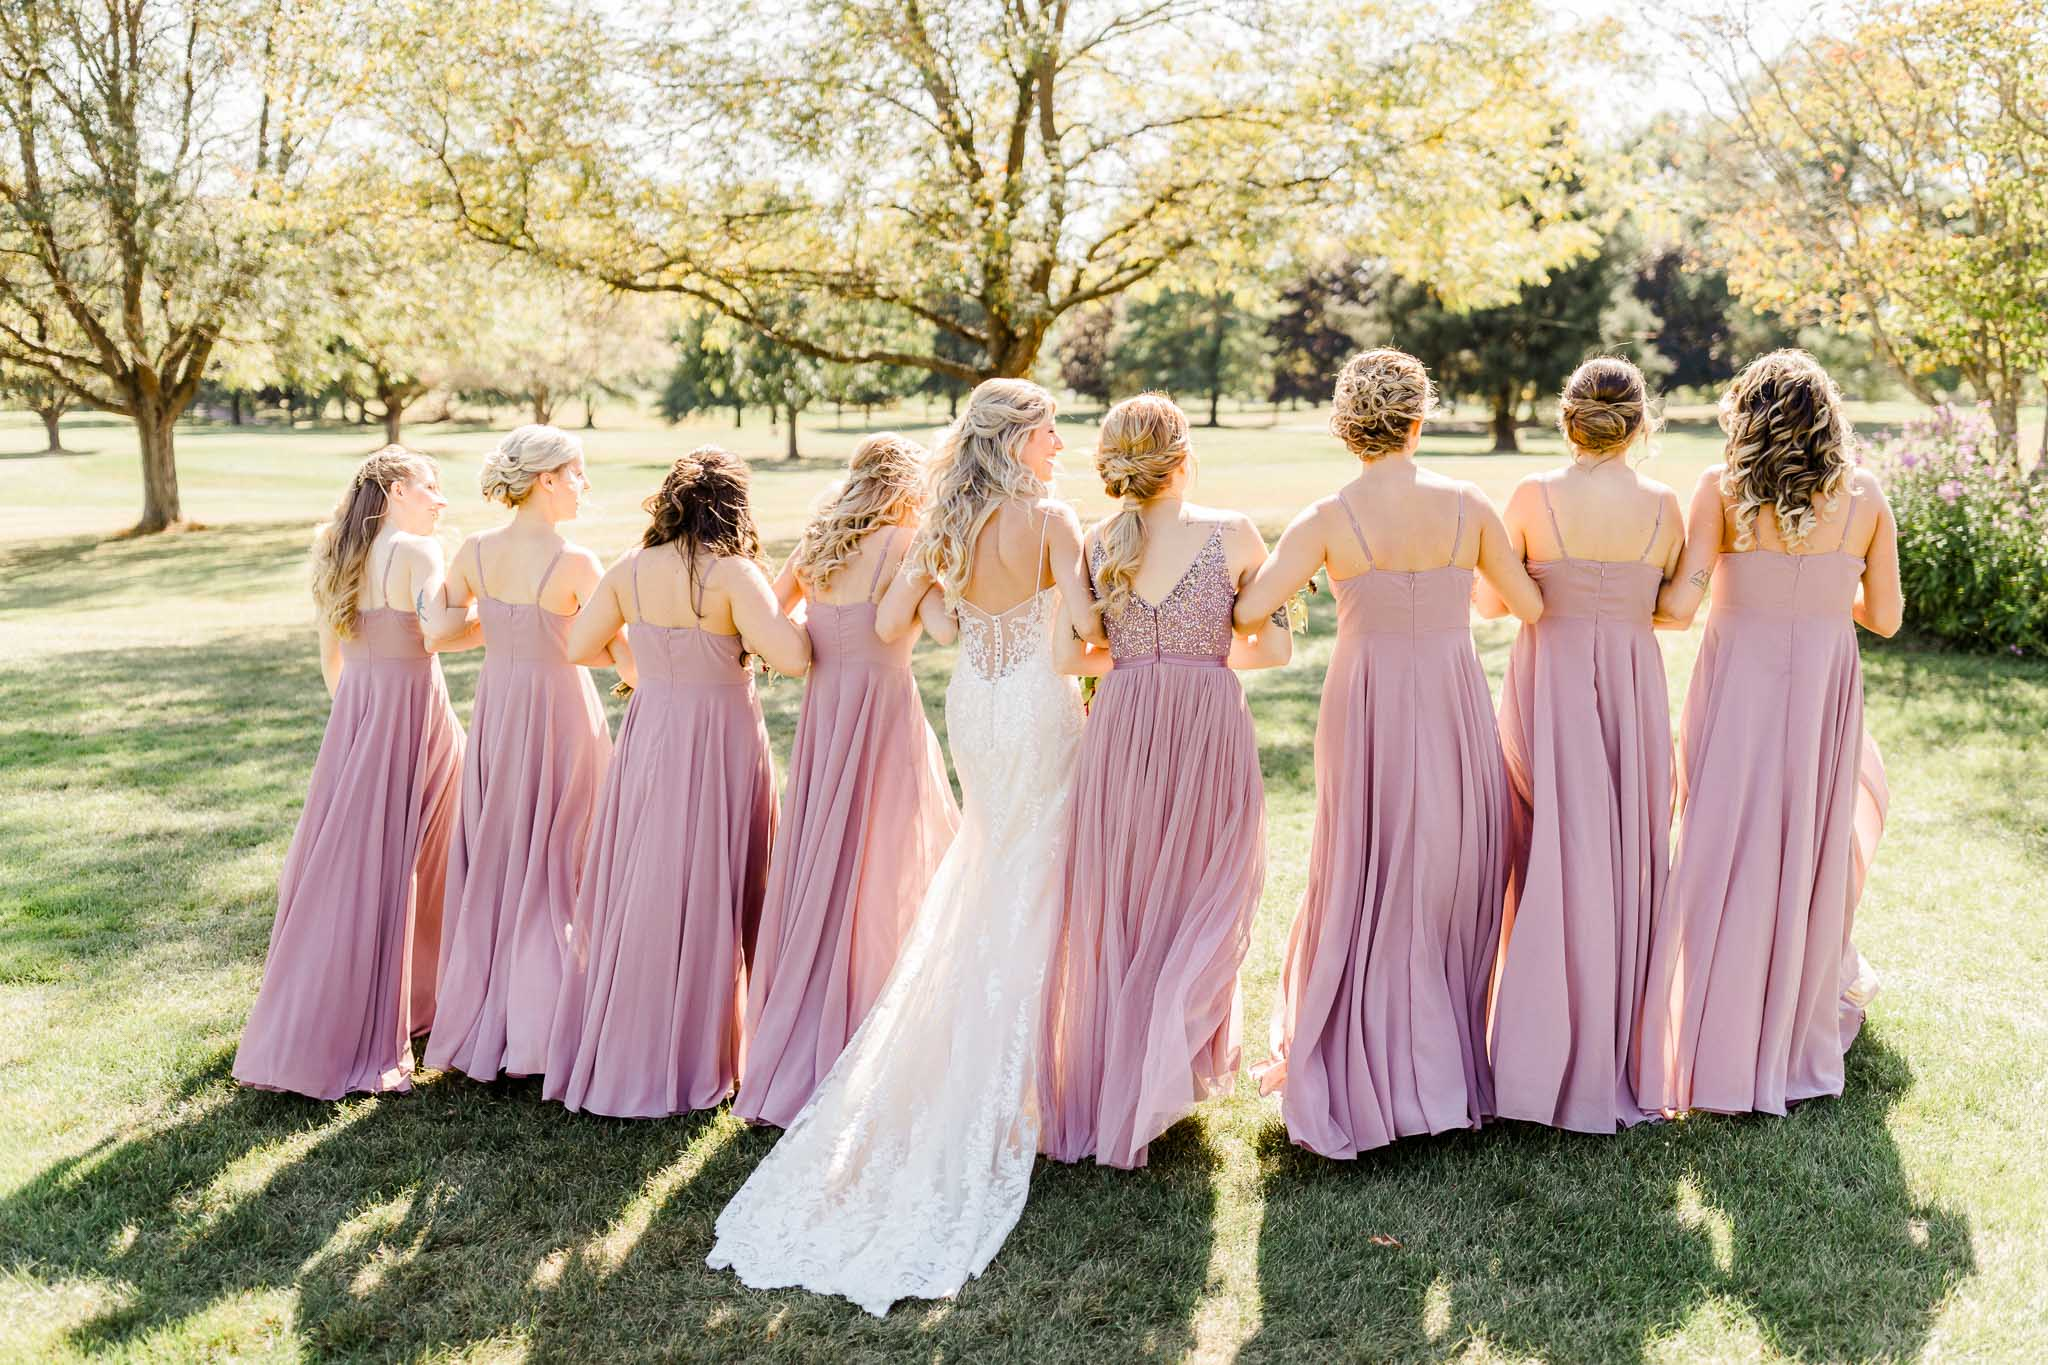 Frosty-Valley-September-Wedding-7590.jpg